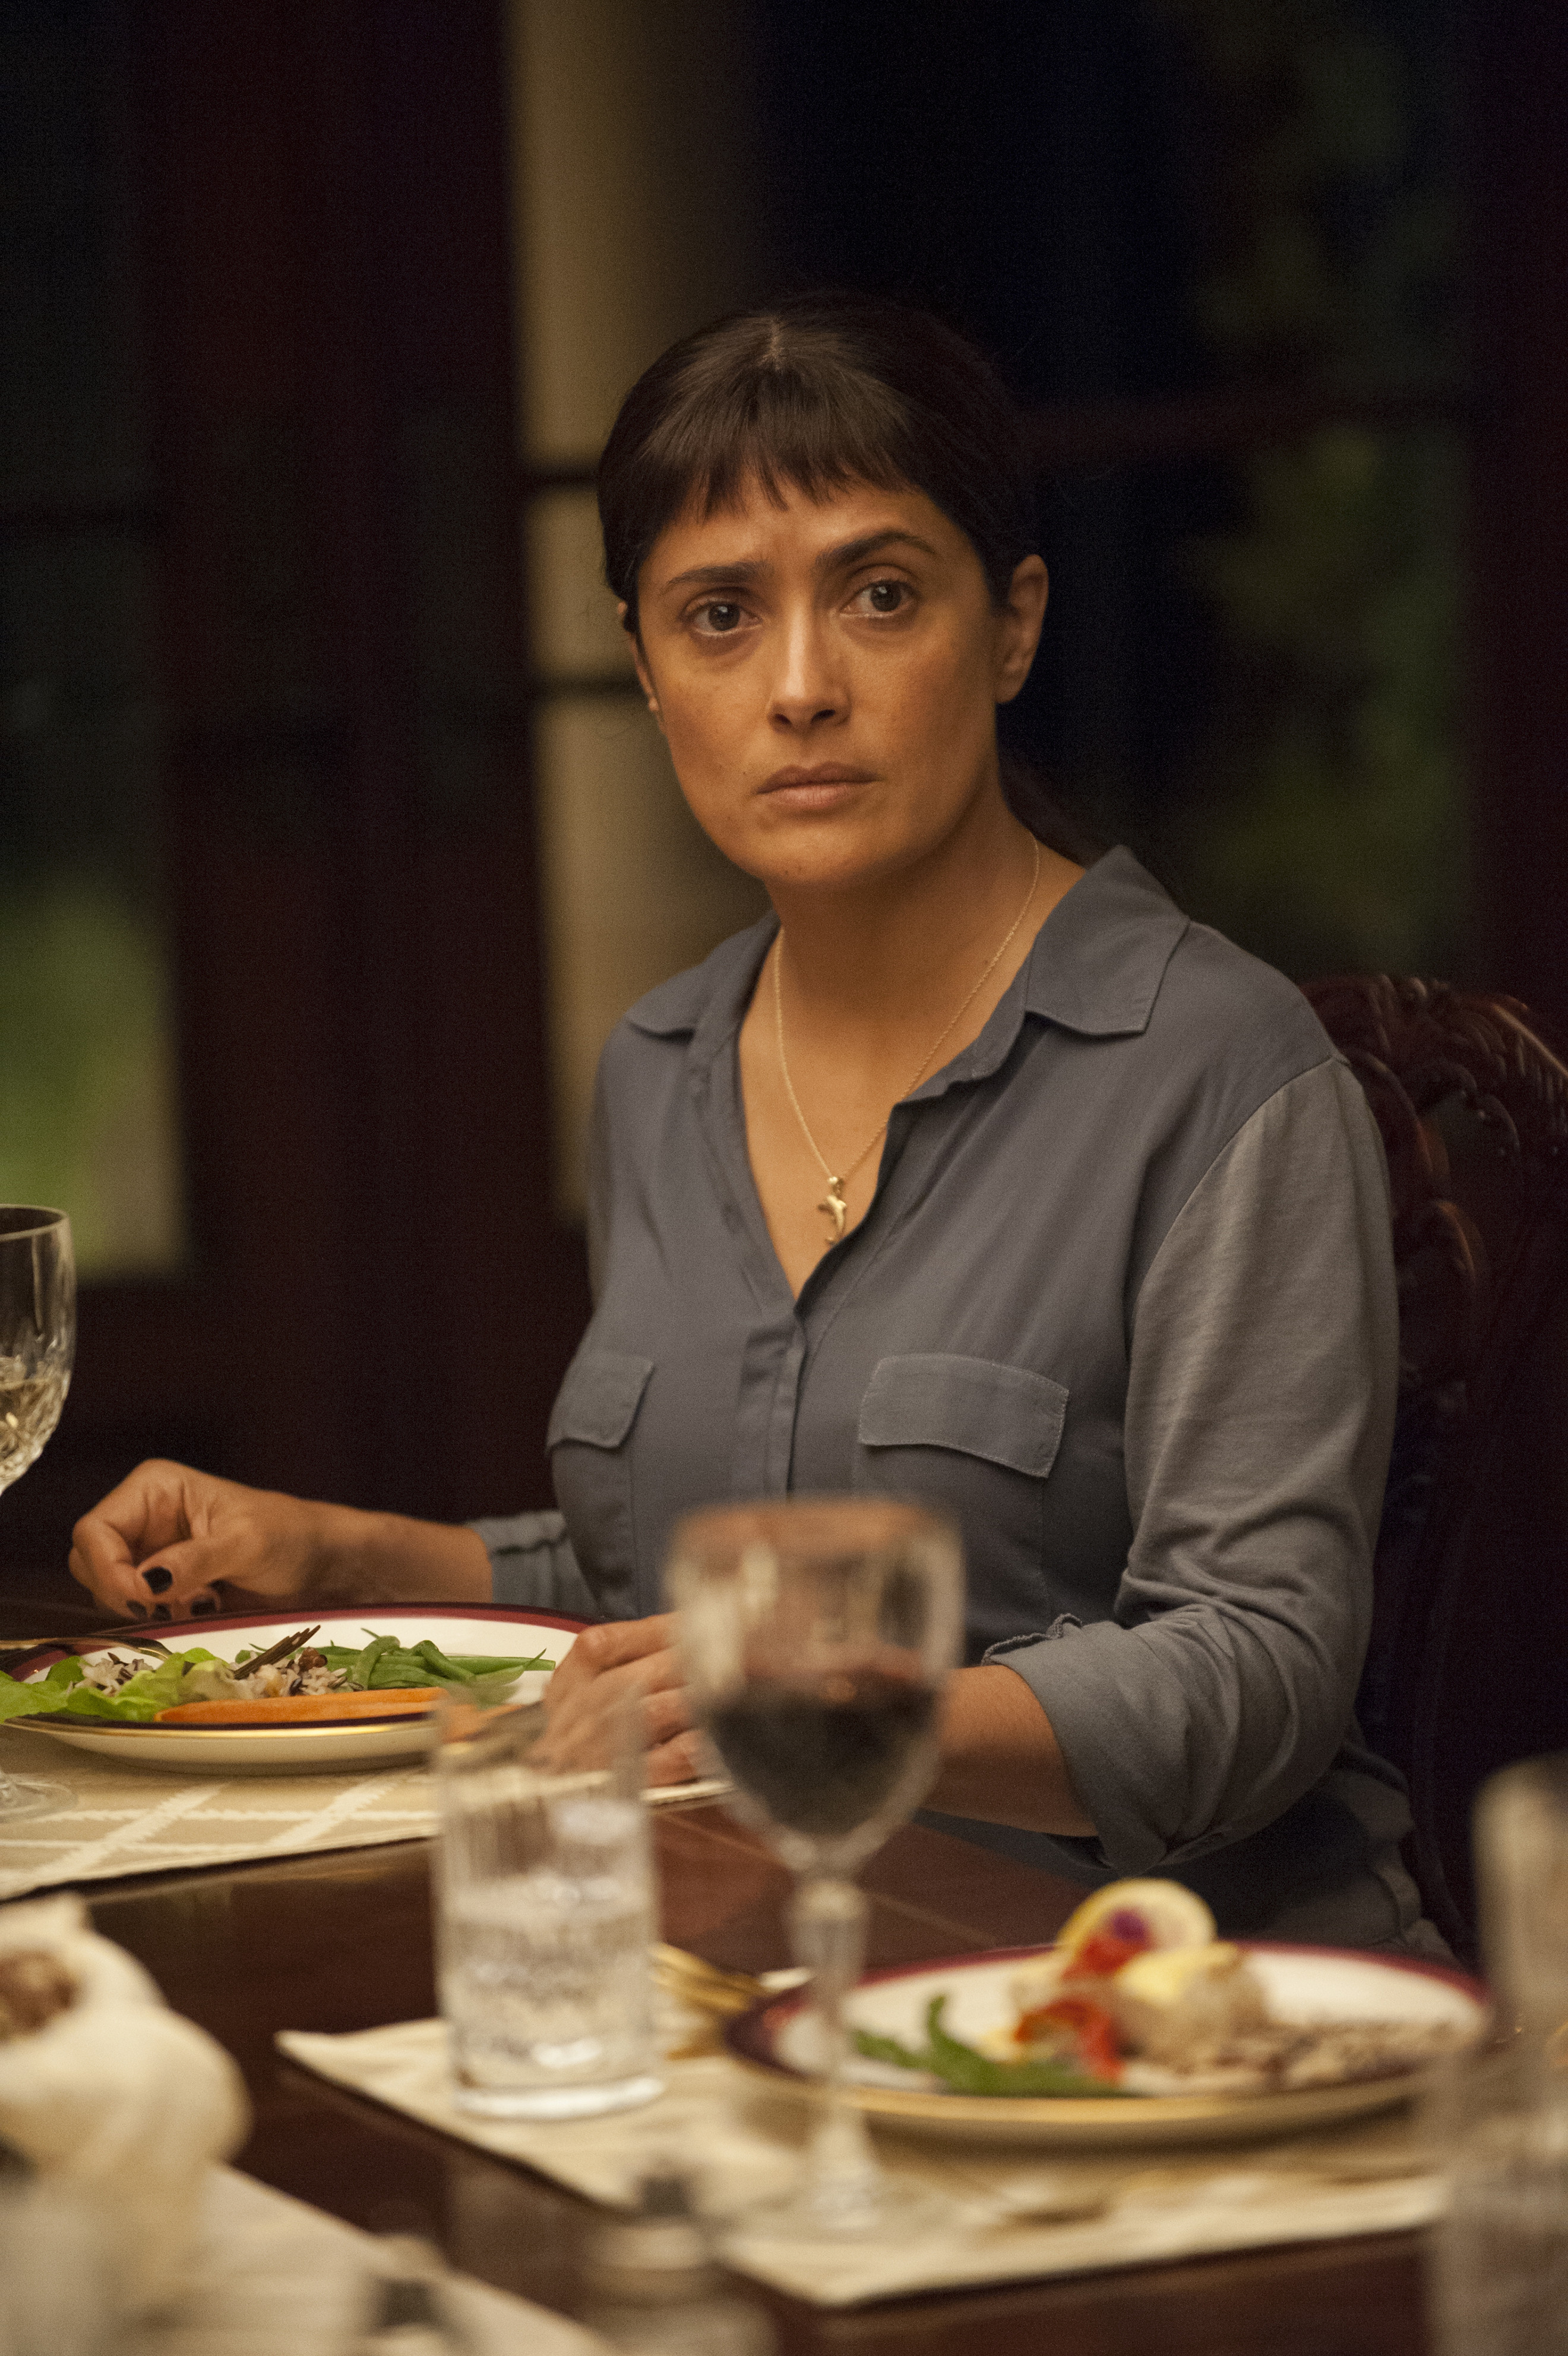 Dinner With Beatriz  Salma Hayek on the Trump Clairvoyance of Beatriz at